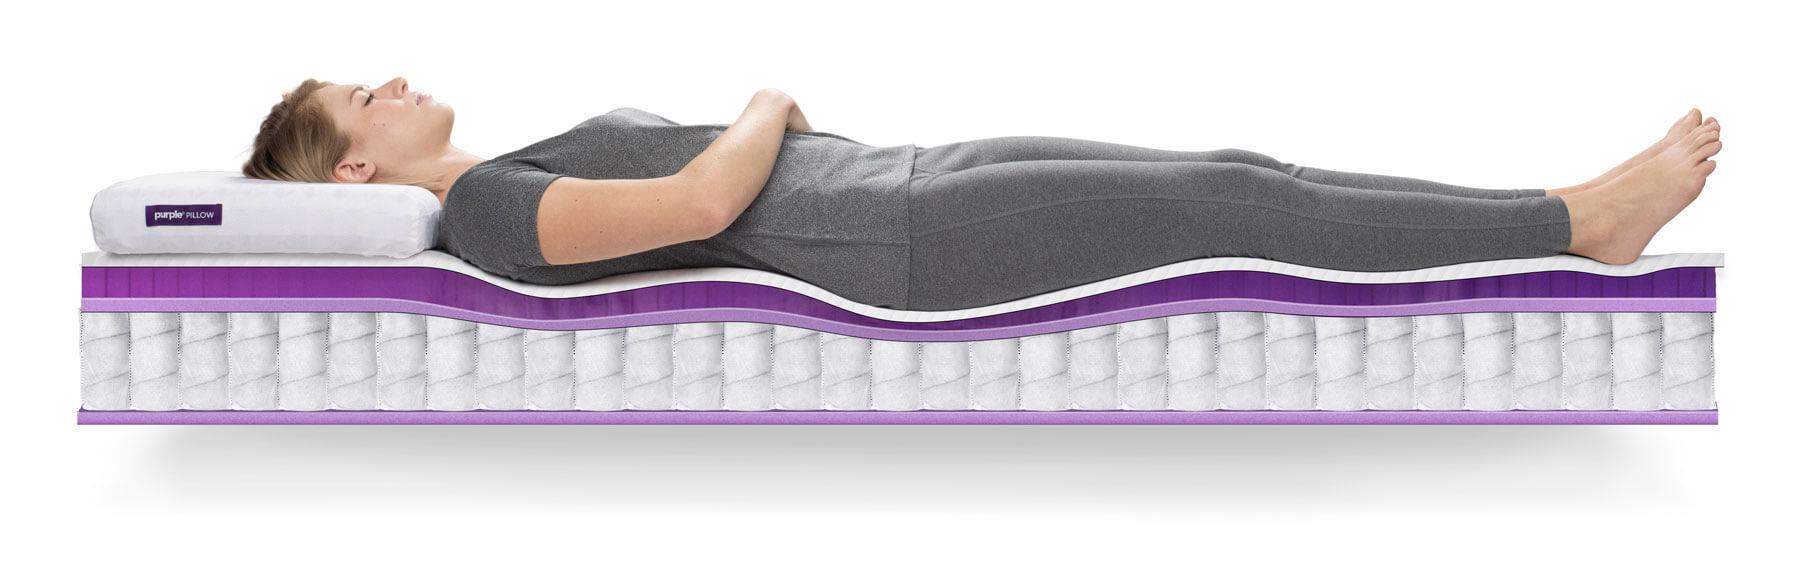 Why Choose the Purple Hybrid?